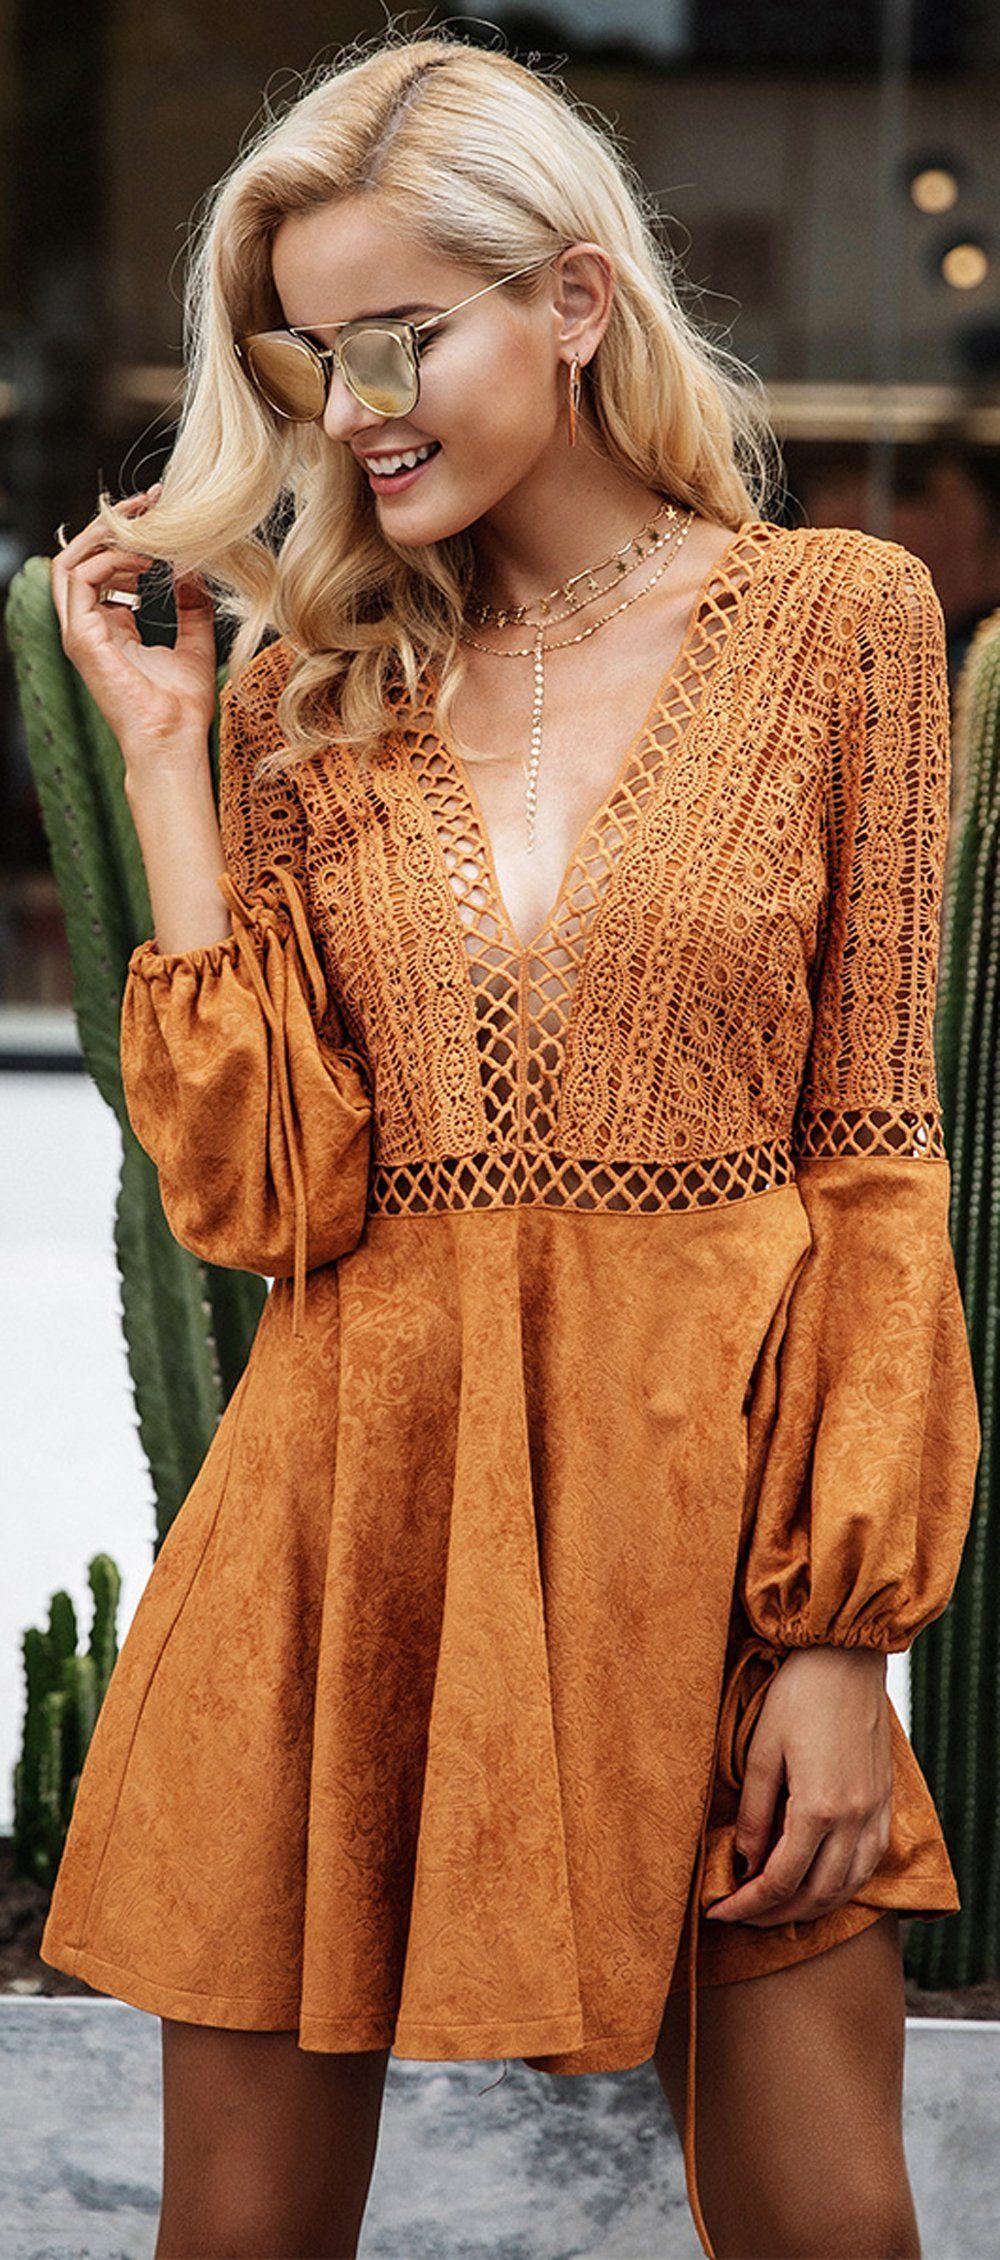 2d334dd61791 Cute Boho Tan Crochet Mini Summer Dress Outfit Ideas - Spring Casual Modest  Boho Bohemian Hippie